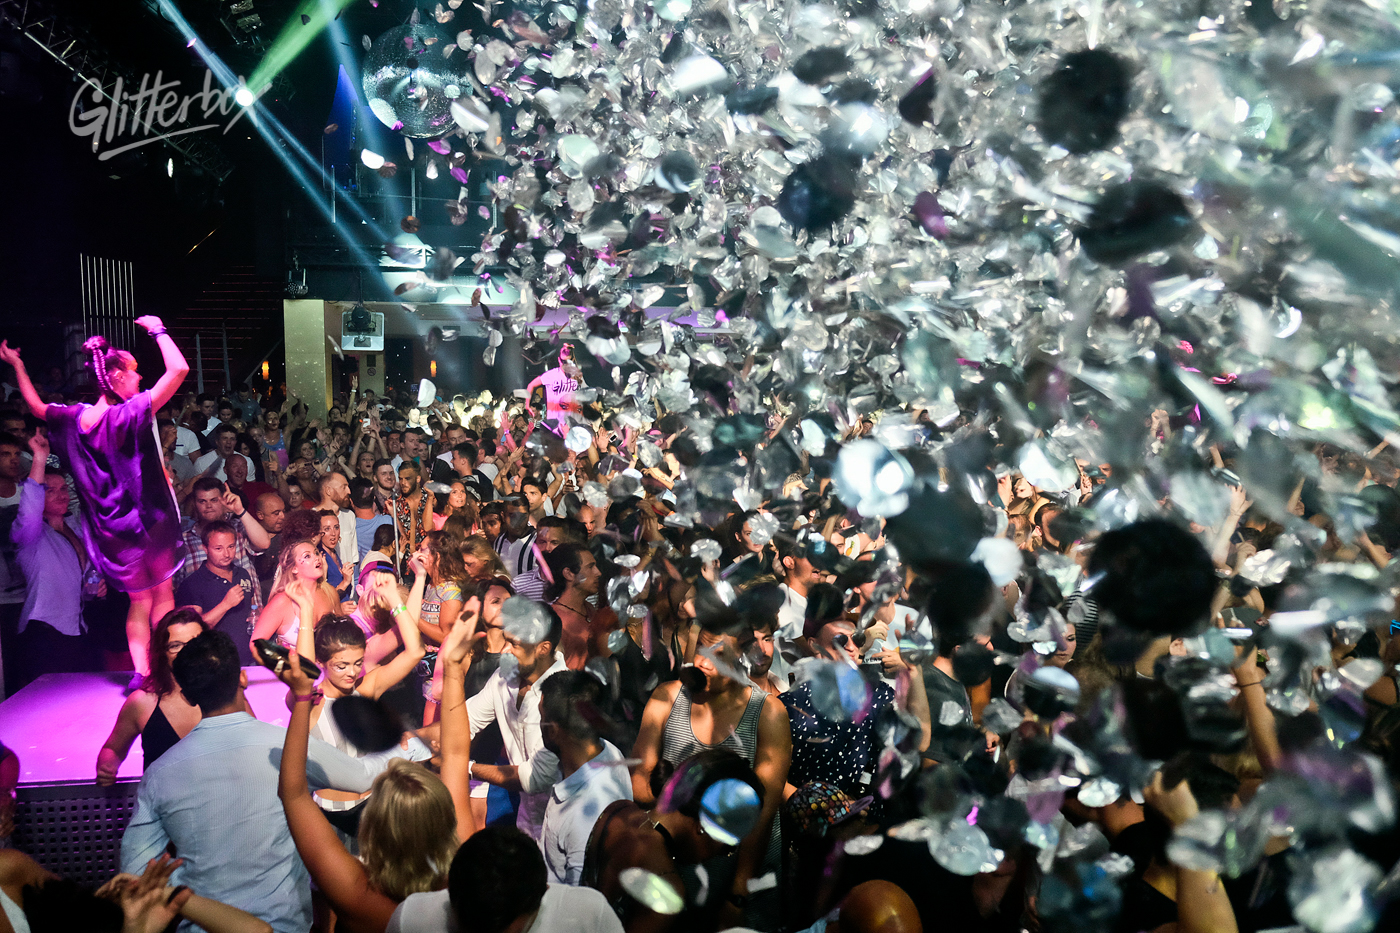 Glitterbox at Space Ibiza